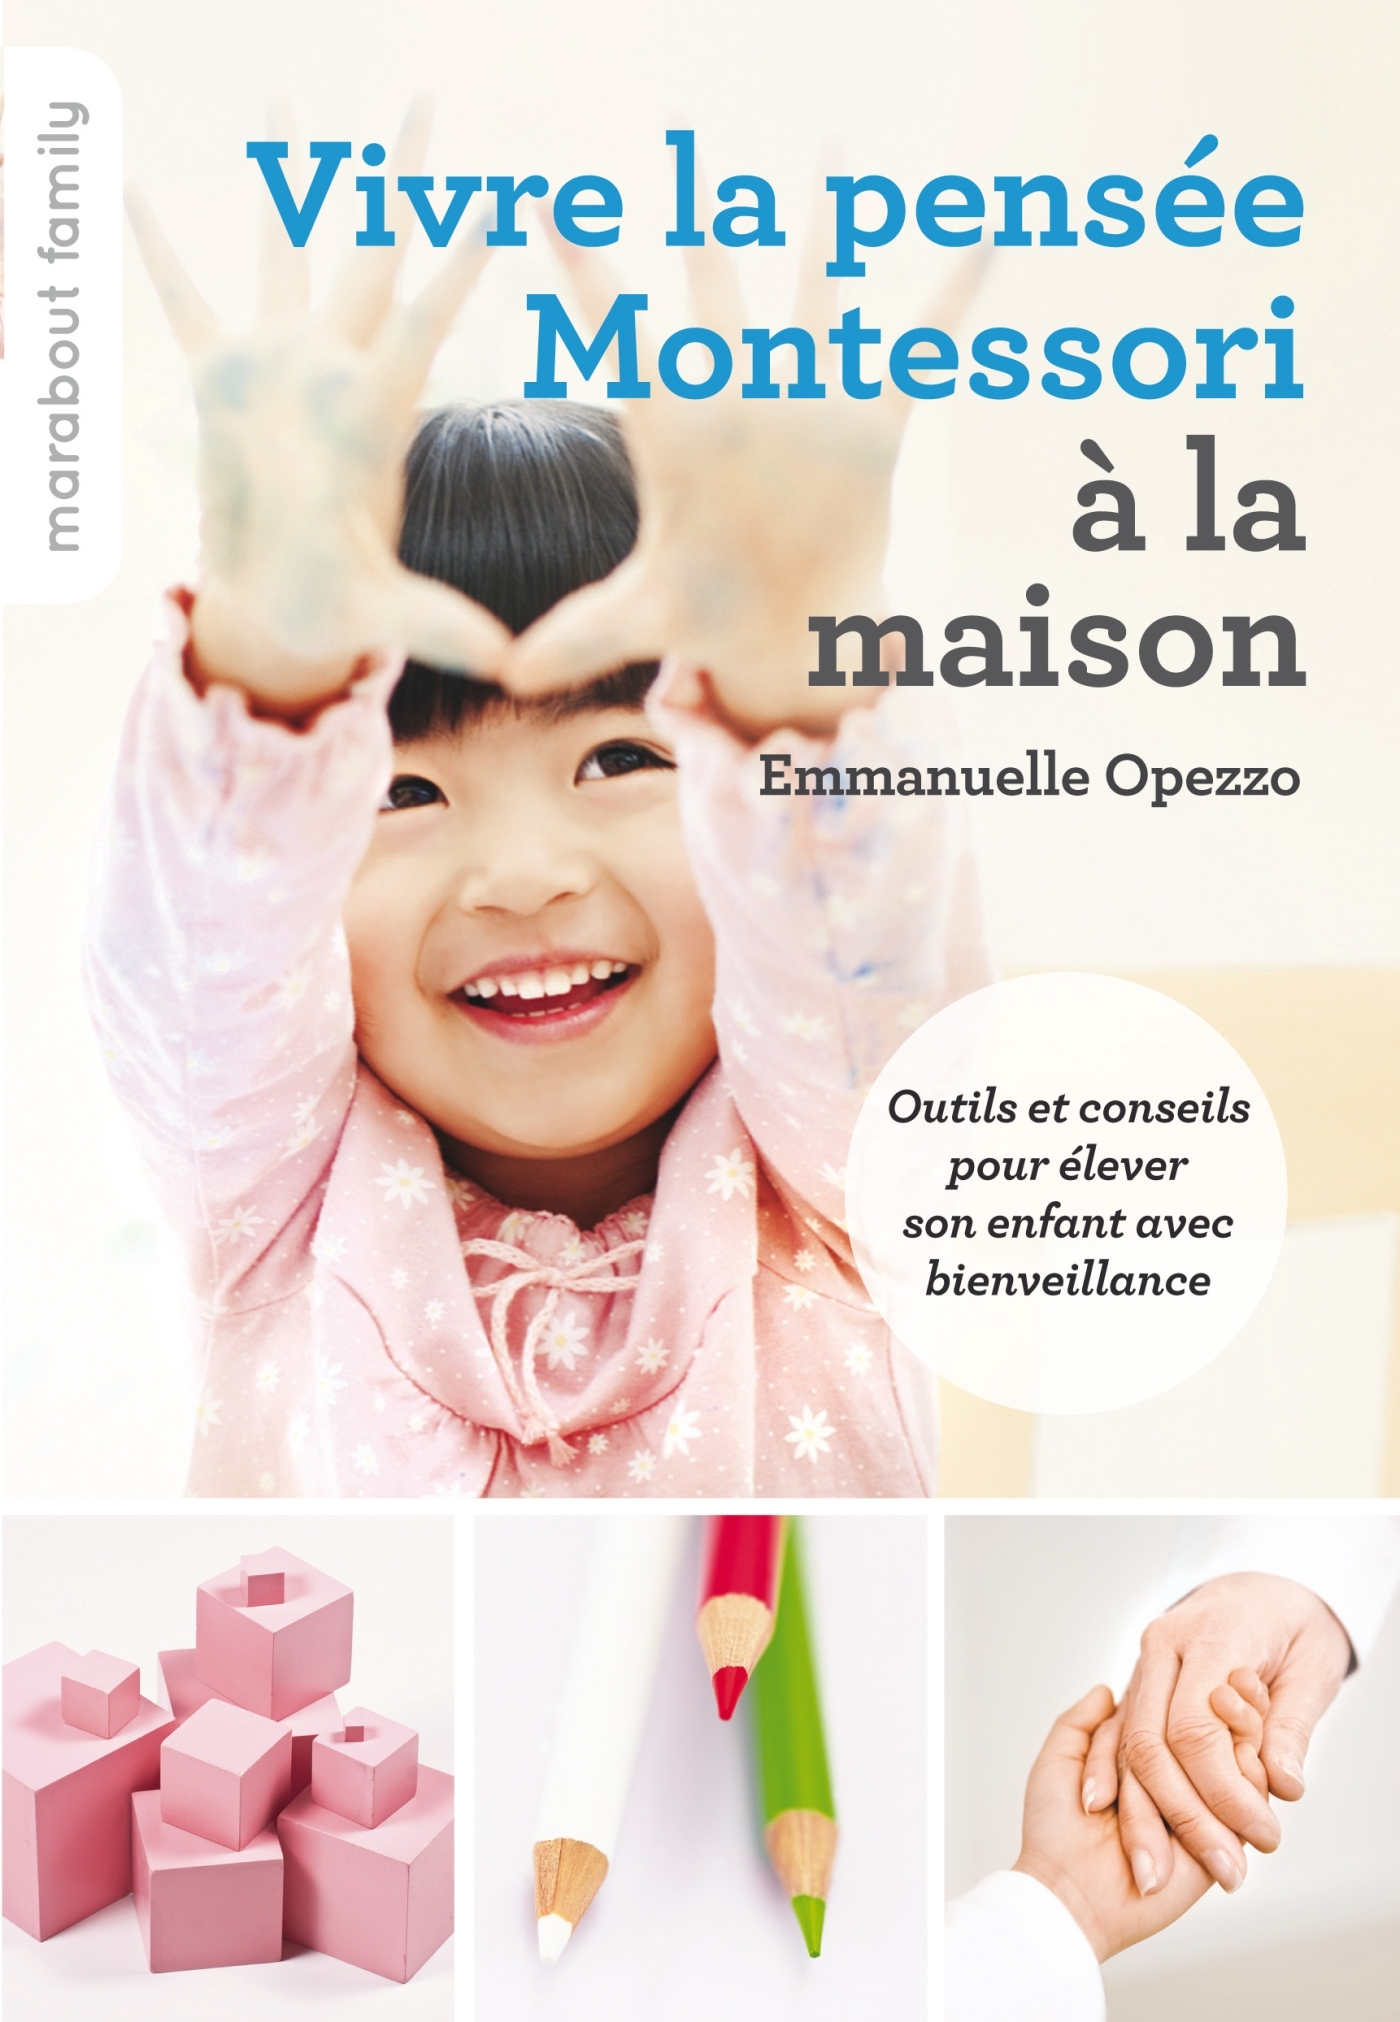 VIVRE LA PENSEE MONTESSORI A LA MAISON